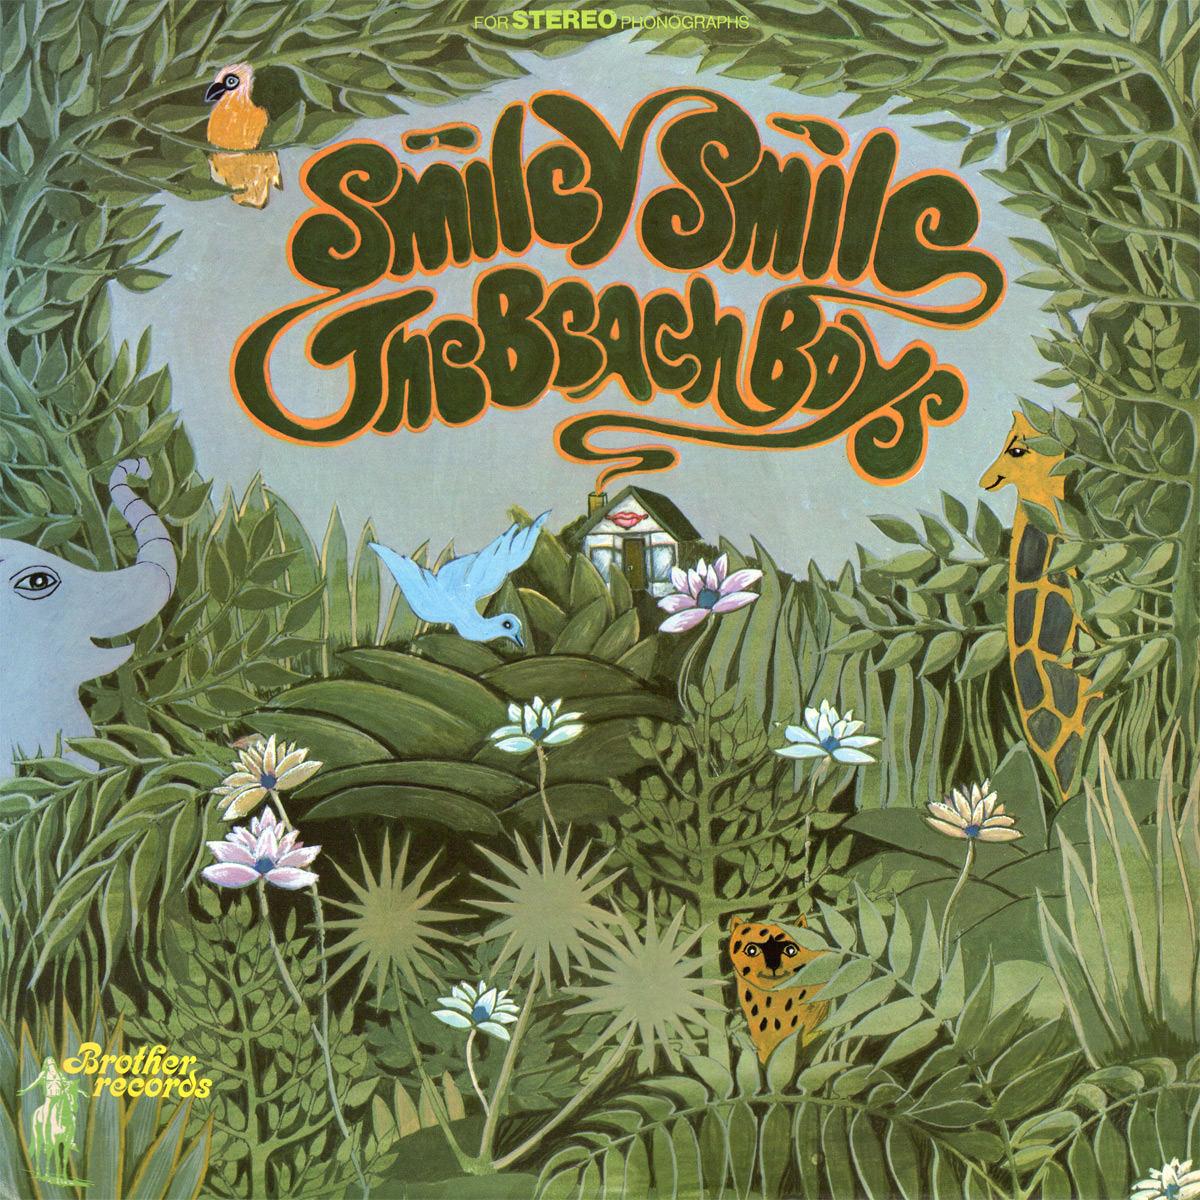 Smiley Smile / Wild Honey cover